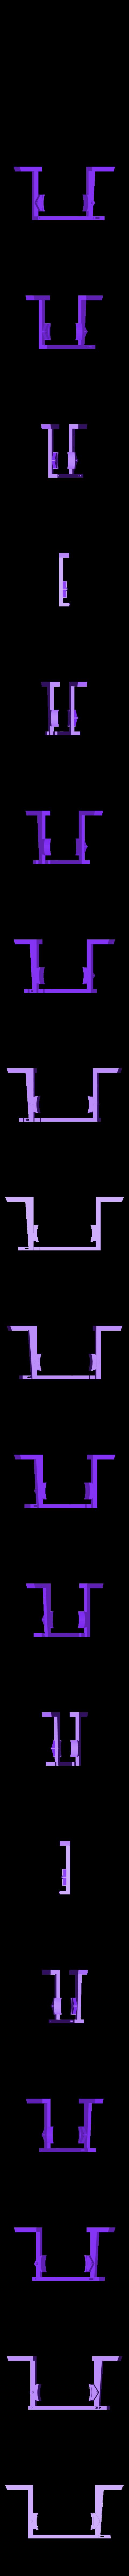 G freins boite essieu 1.STL Download STL file Draisine Matisa for LGB • 3D printable object, biddle